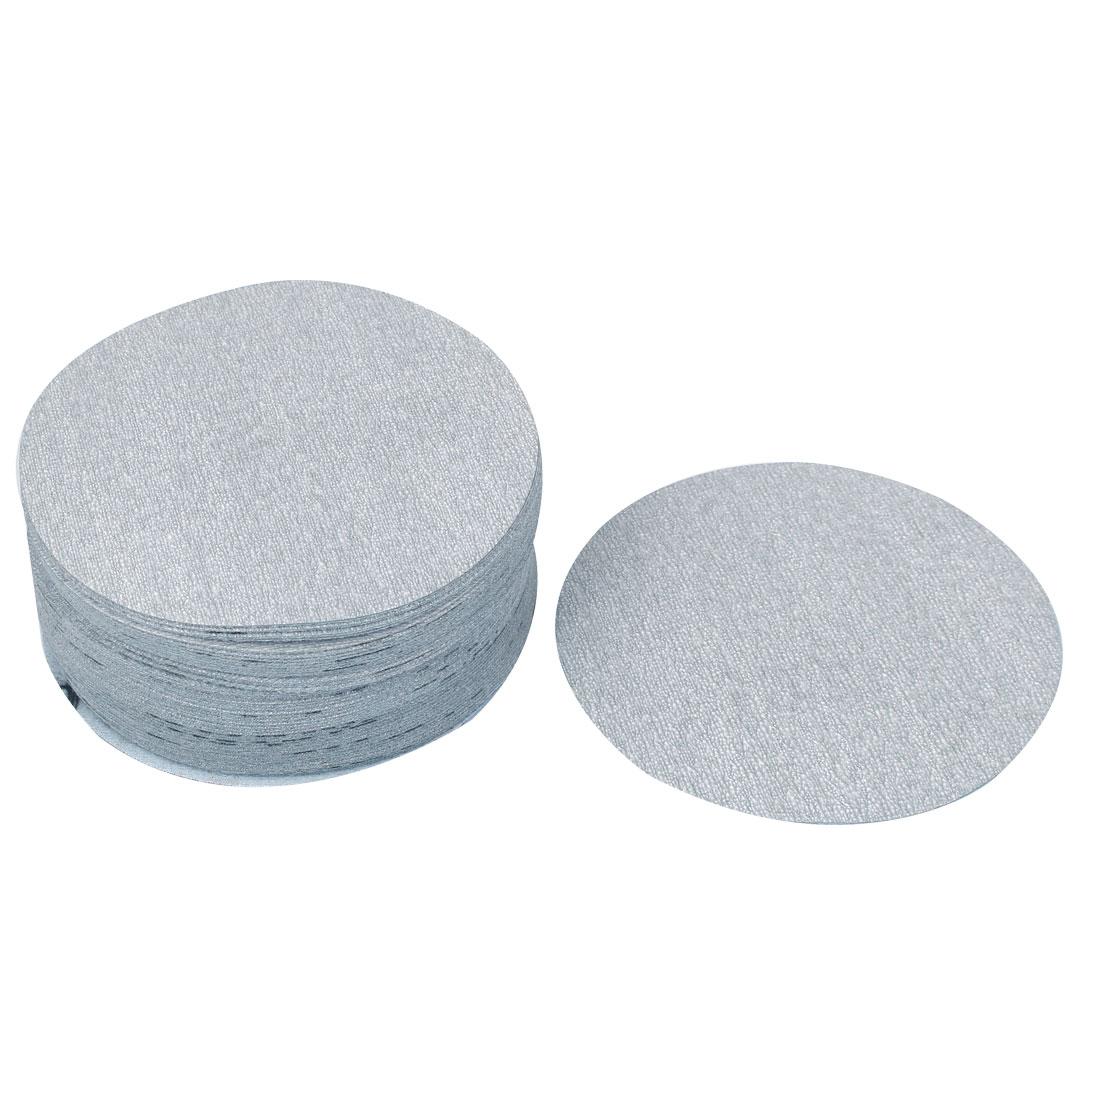 5inch Dia Round Dry Abrasive Sanding Flocking Sandpaper Disc 1000 Grit 50pcs